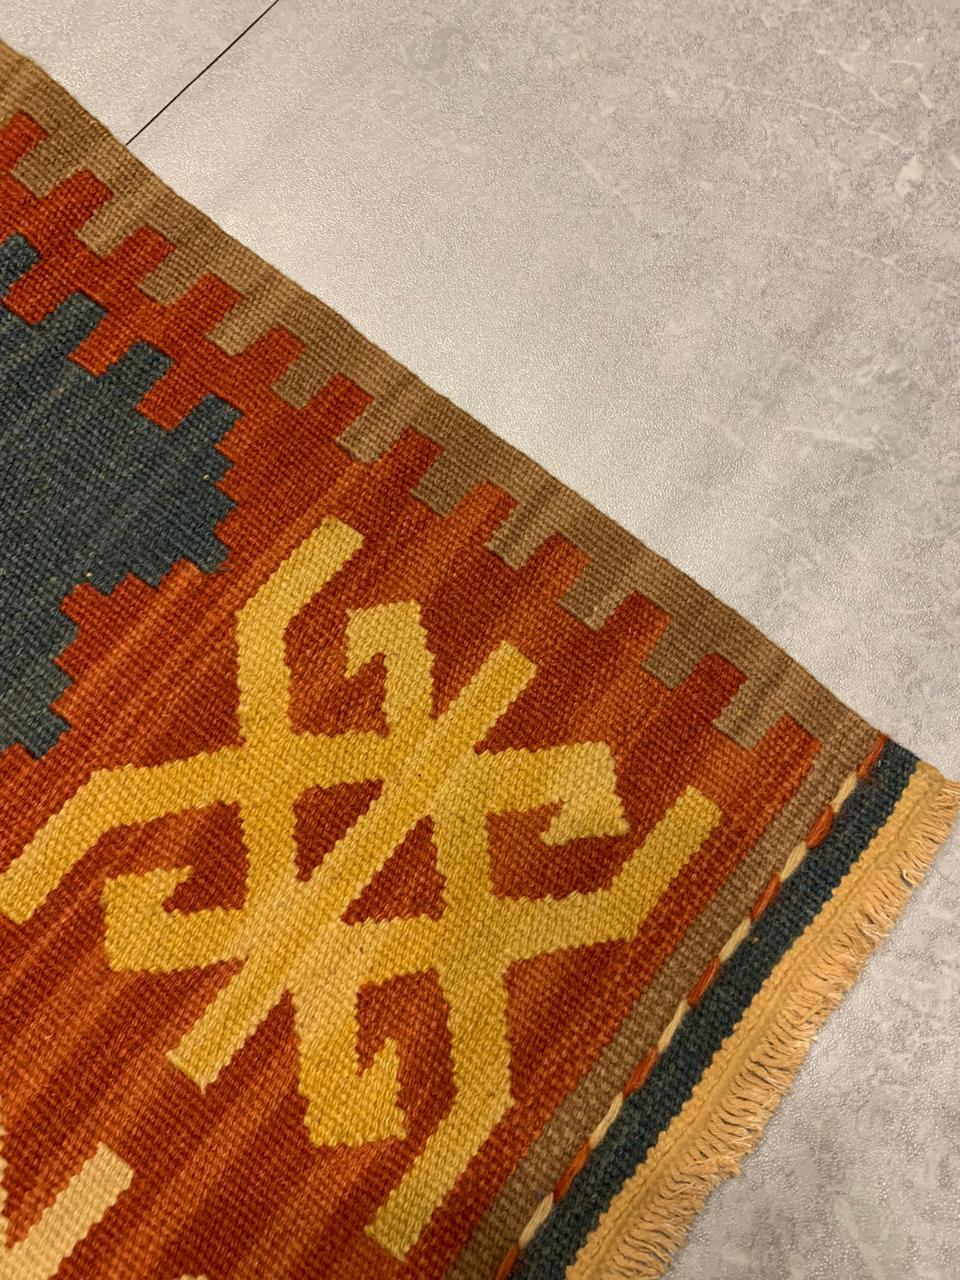 carpet-offcuts